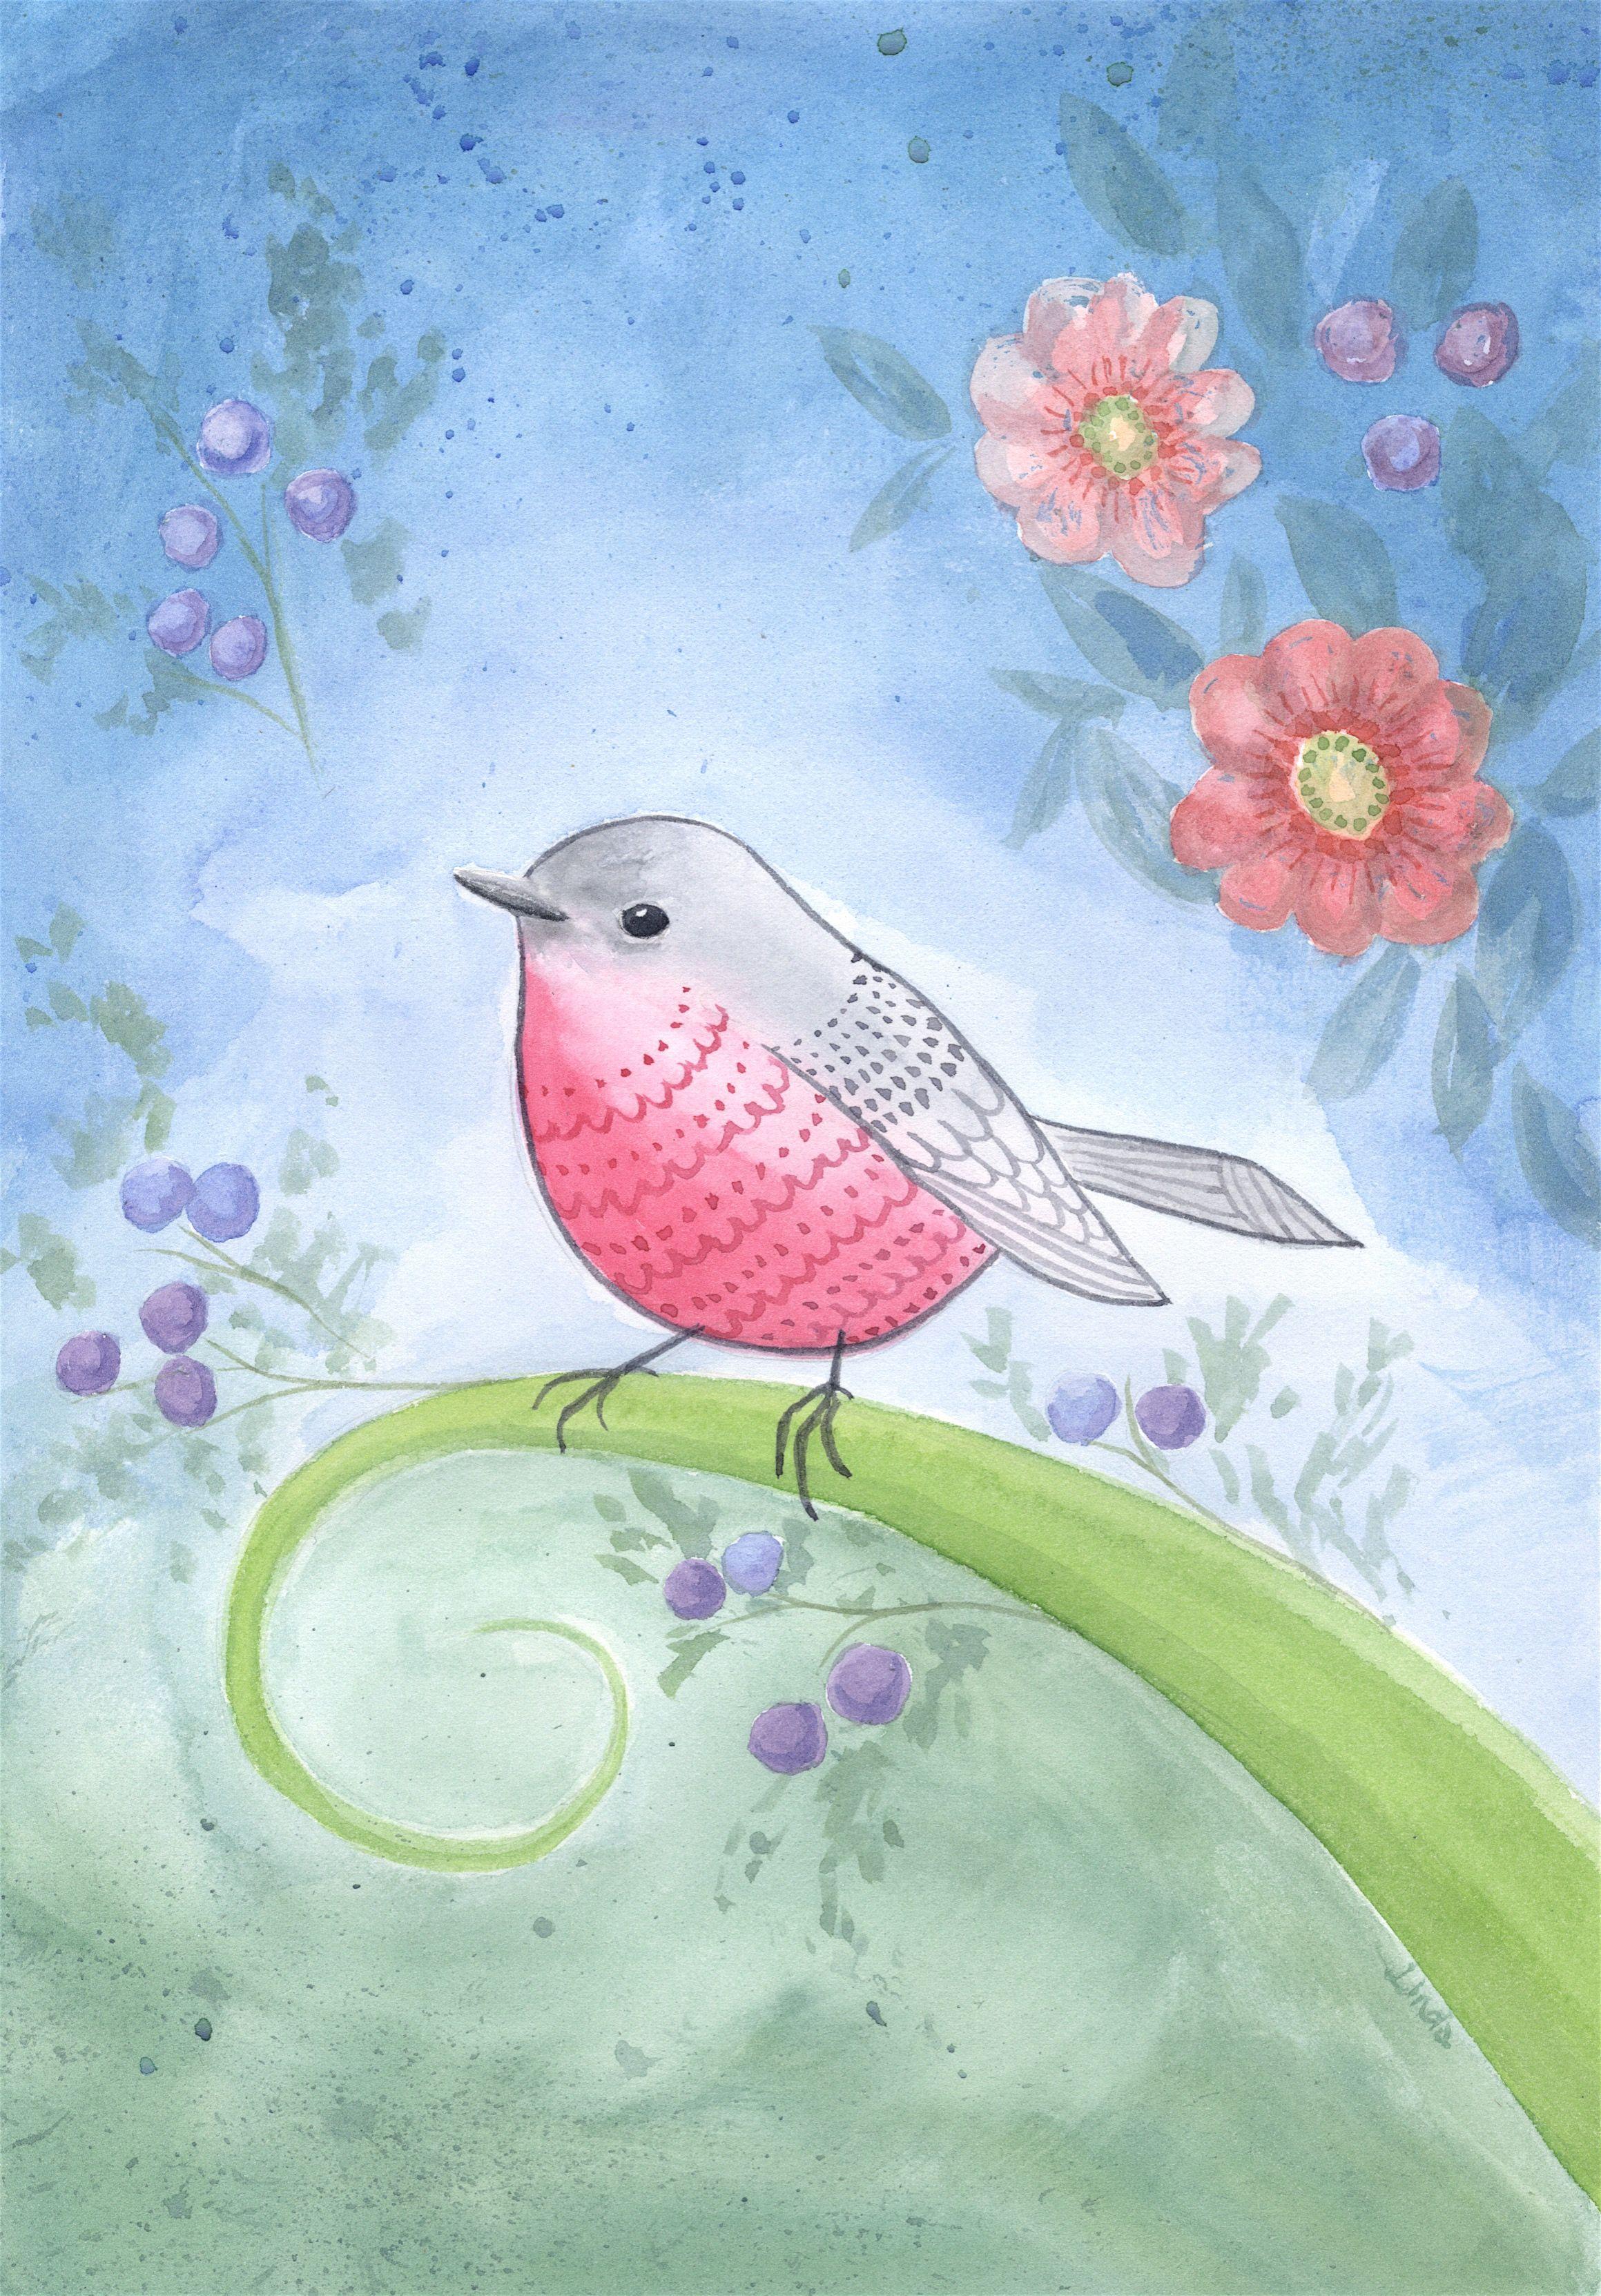 Sweet little whimsical pink robin.